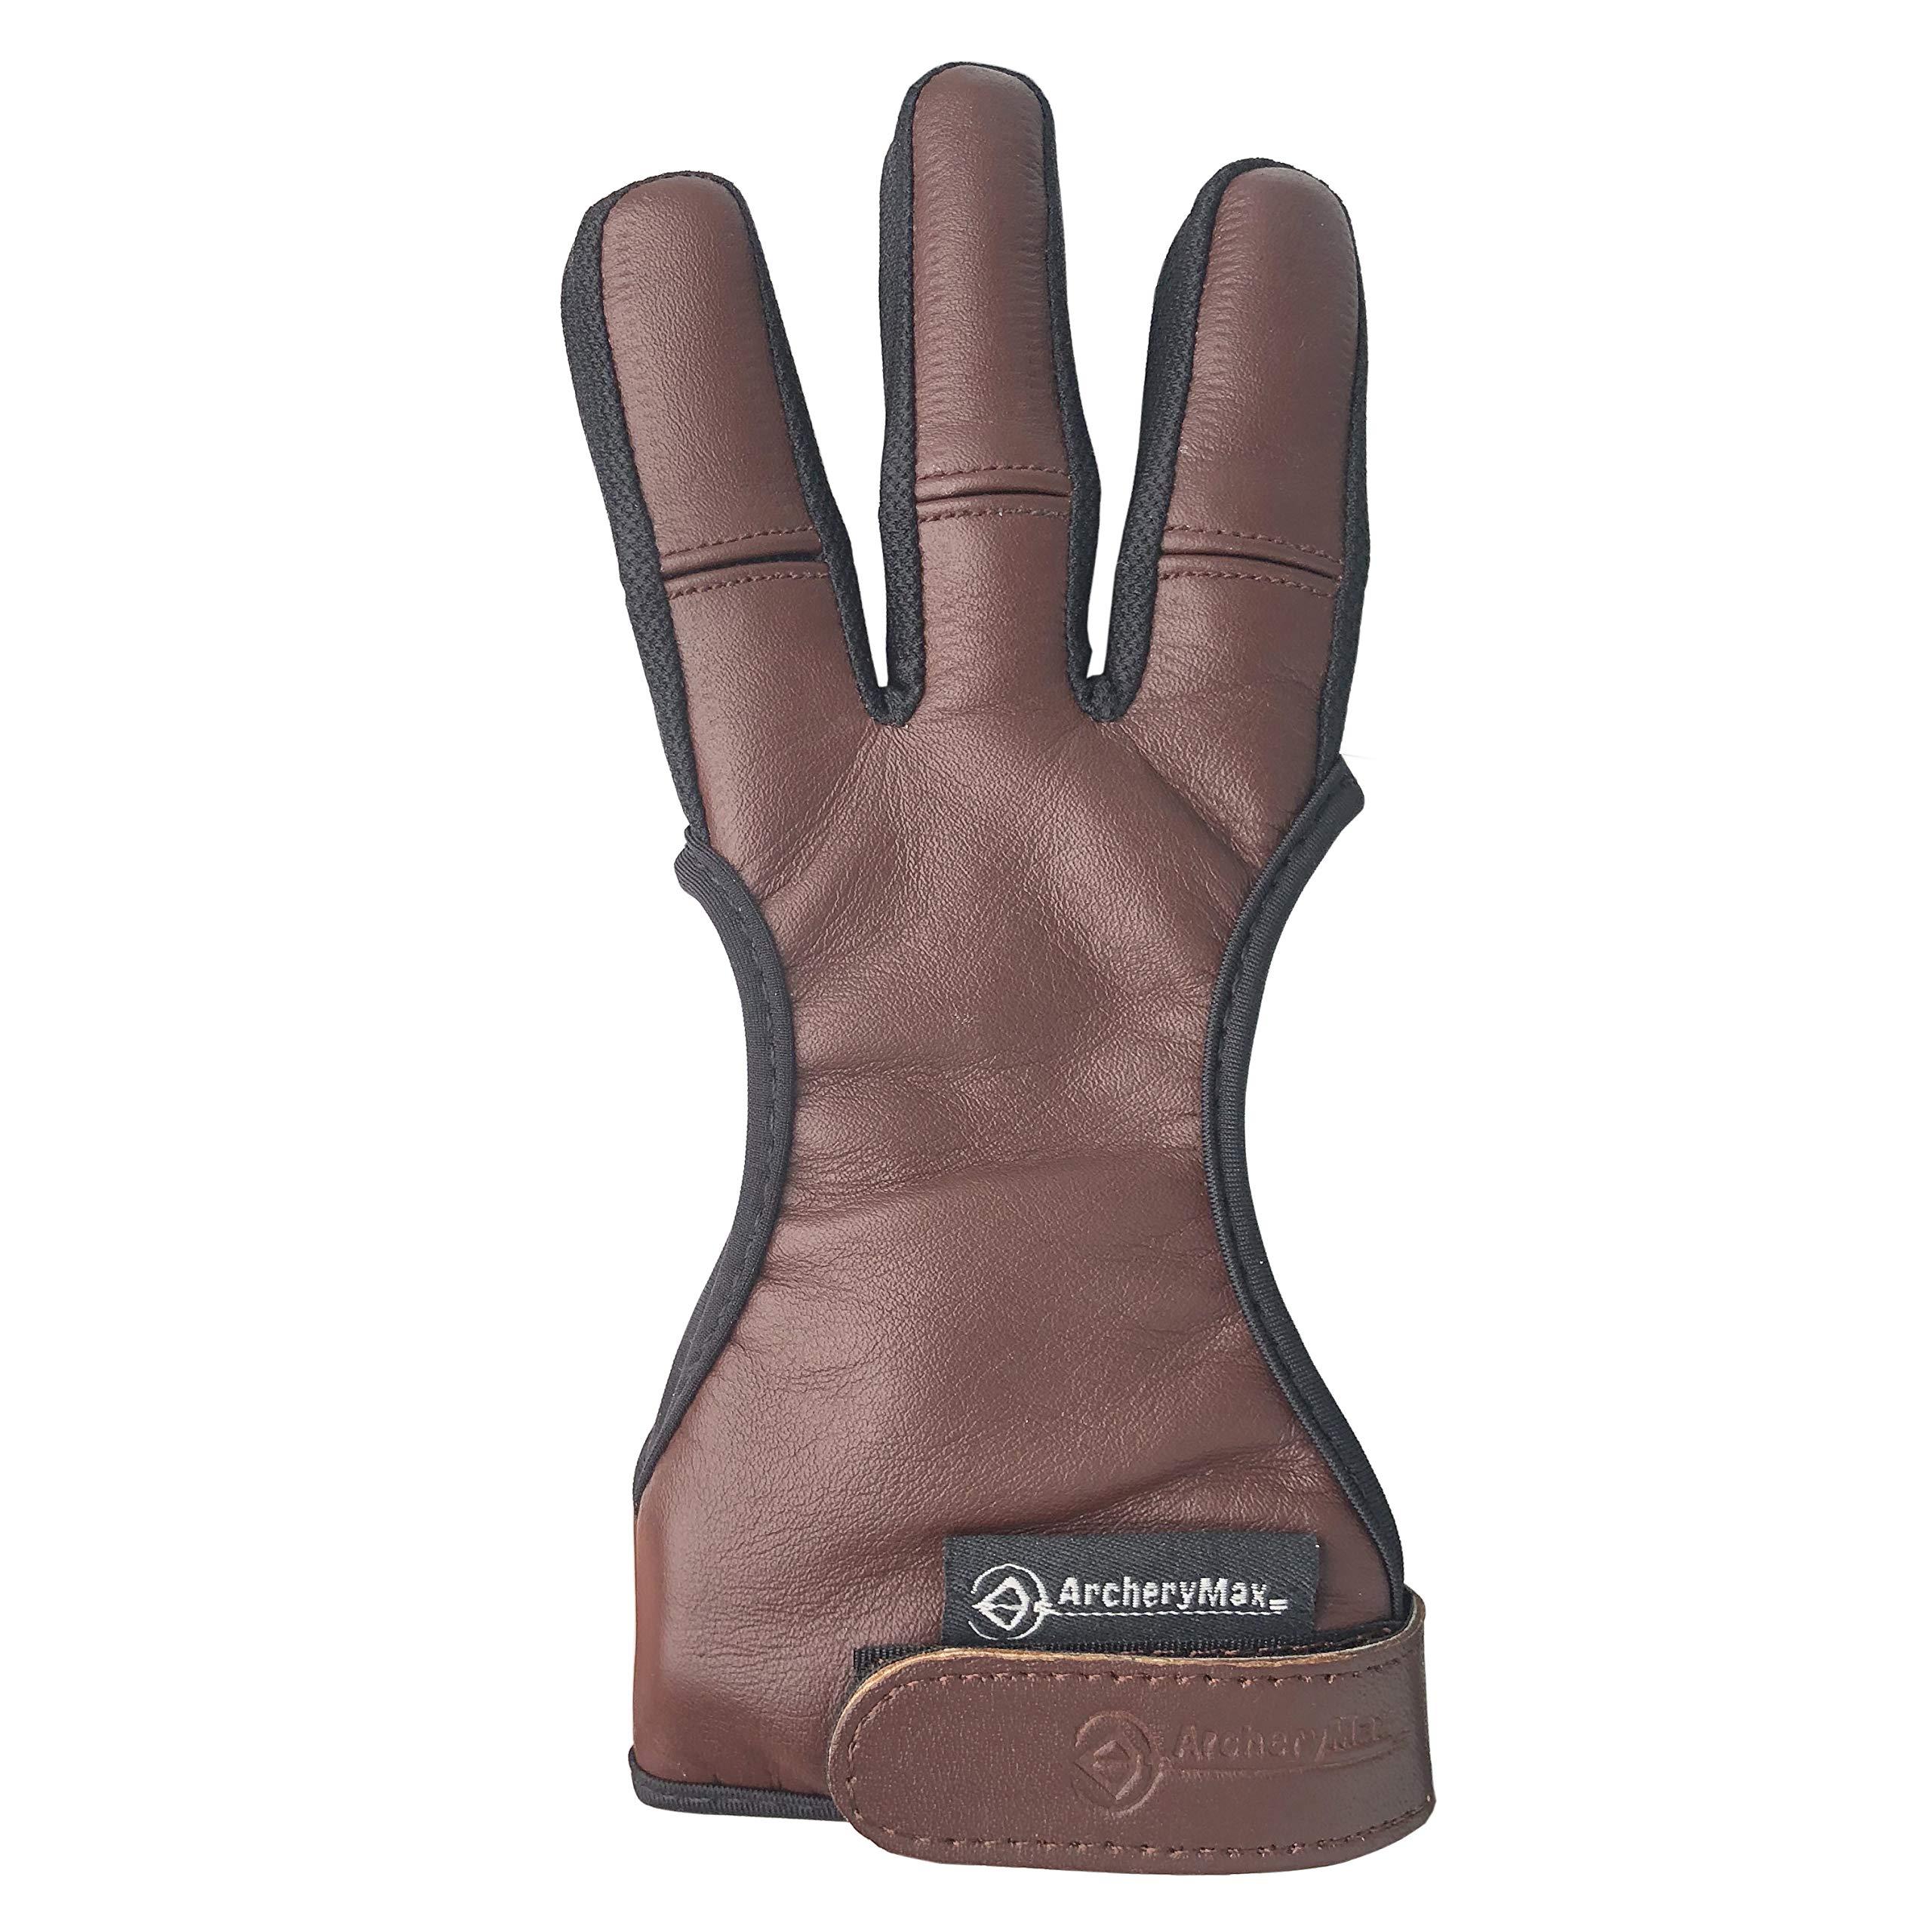 ArcheryMax Handmade Brown Leather Three Finger Archery Gloves (Dark Brown, X-Large) by ArcheryMax